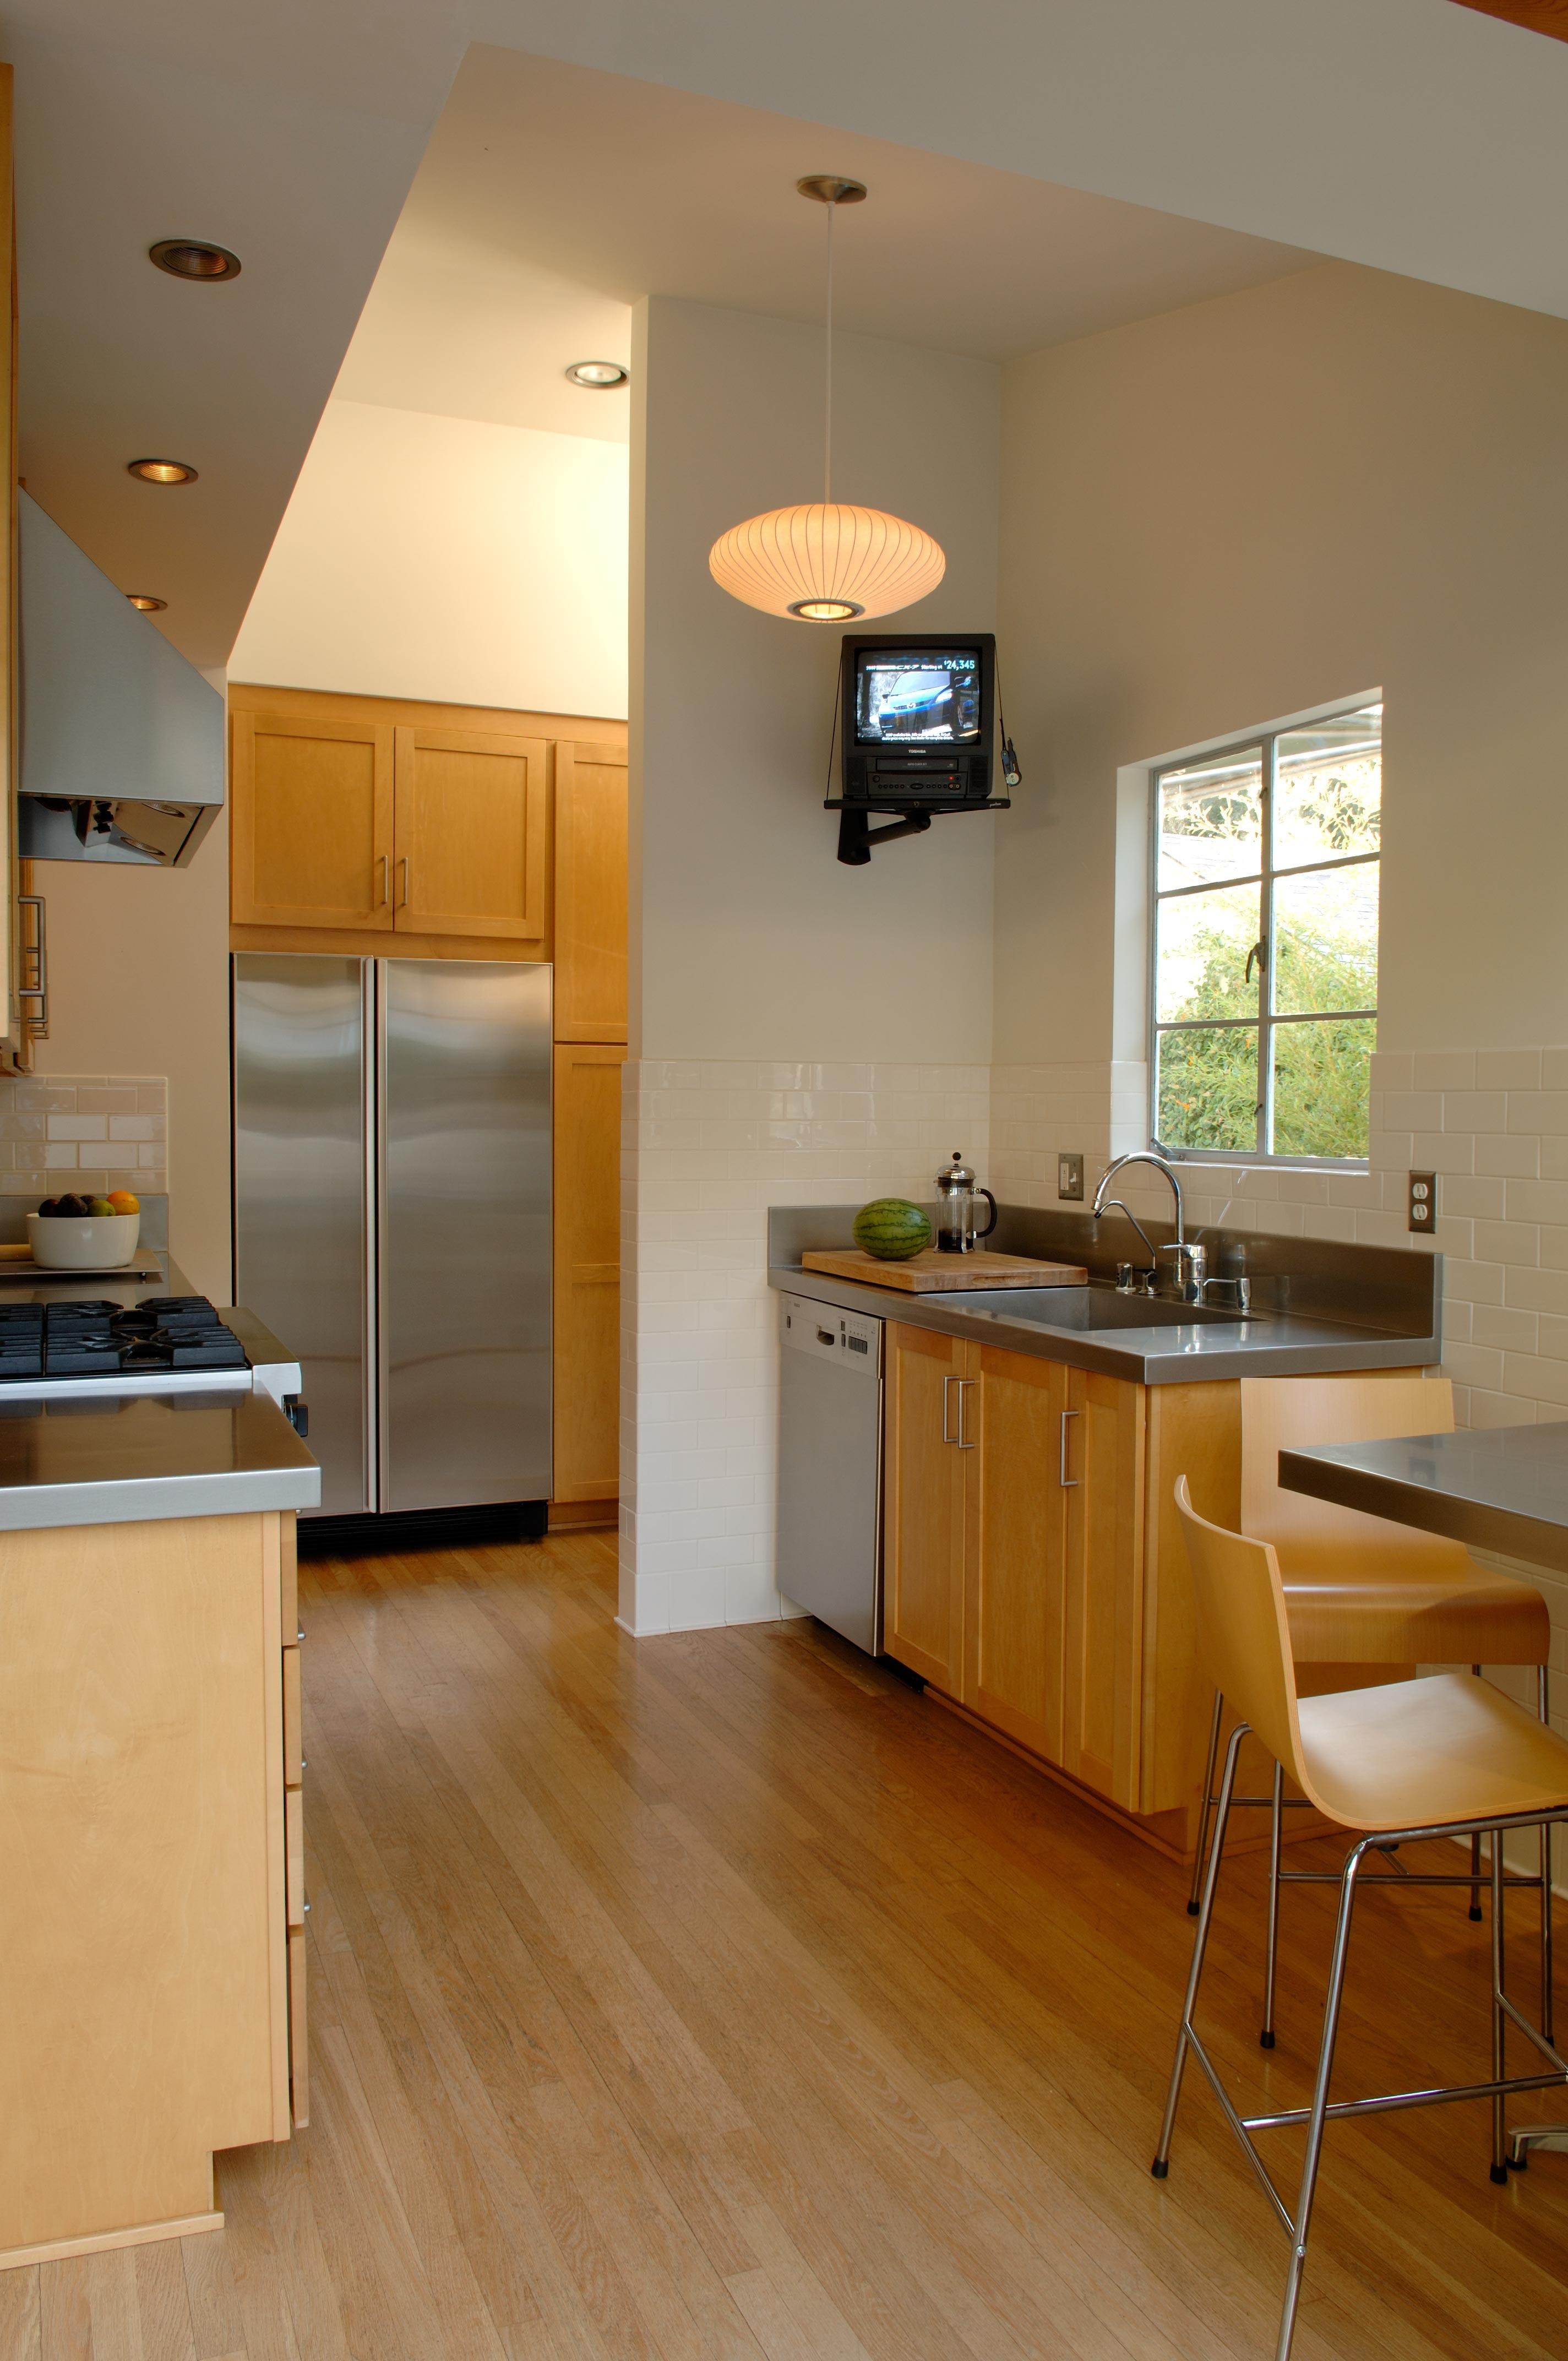 Fer murphy levitz residence kitchen